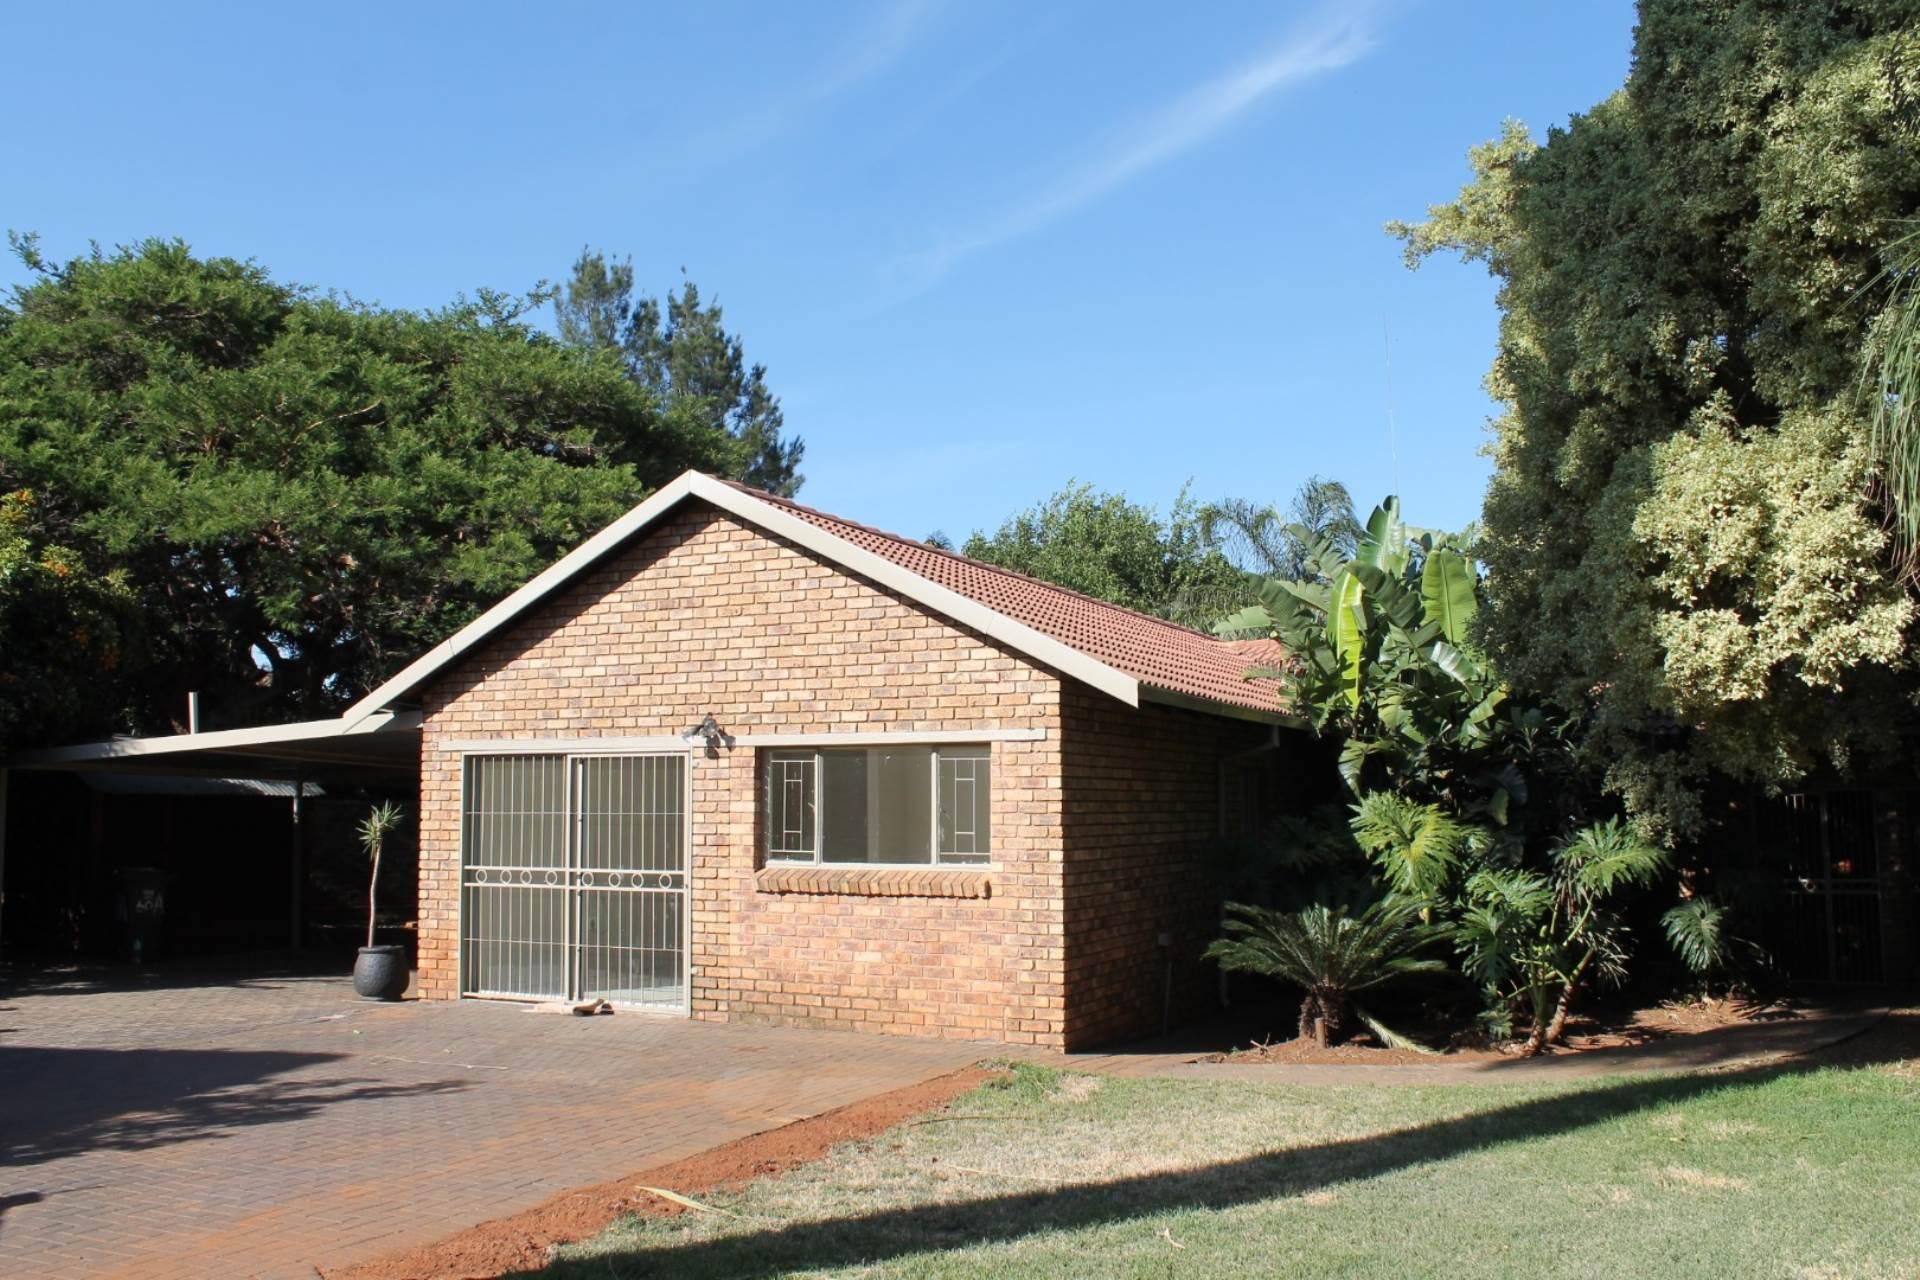 Akasia, Ninapark Property  | Houses For Sale Ninapark, NINAPARK, House 3 bedrooms property for sale Price:1,280,000